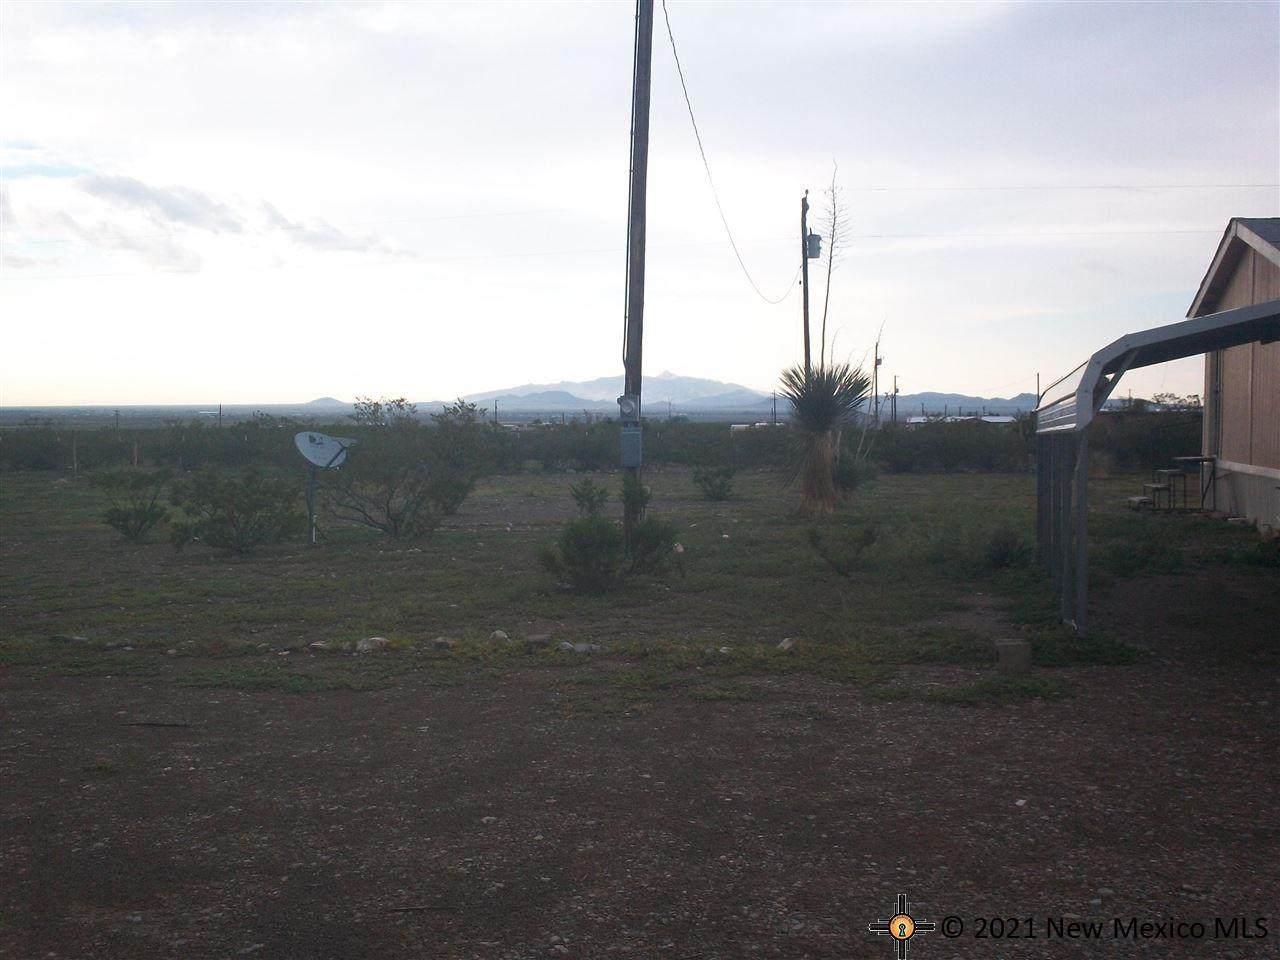 https://bt-photos.global.ssl.fastly.net/newmexico/orig_boomver_1_20214938-2.jpg